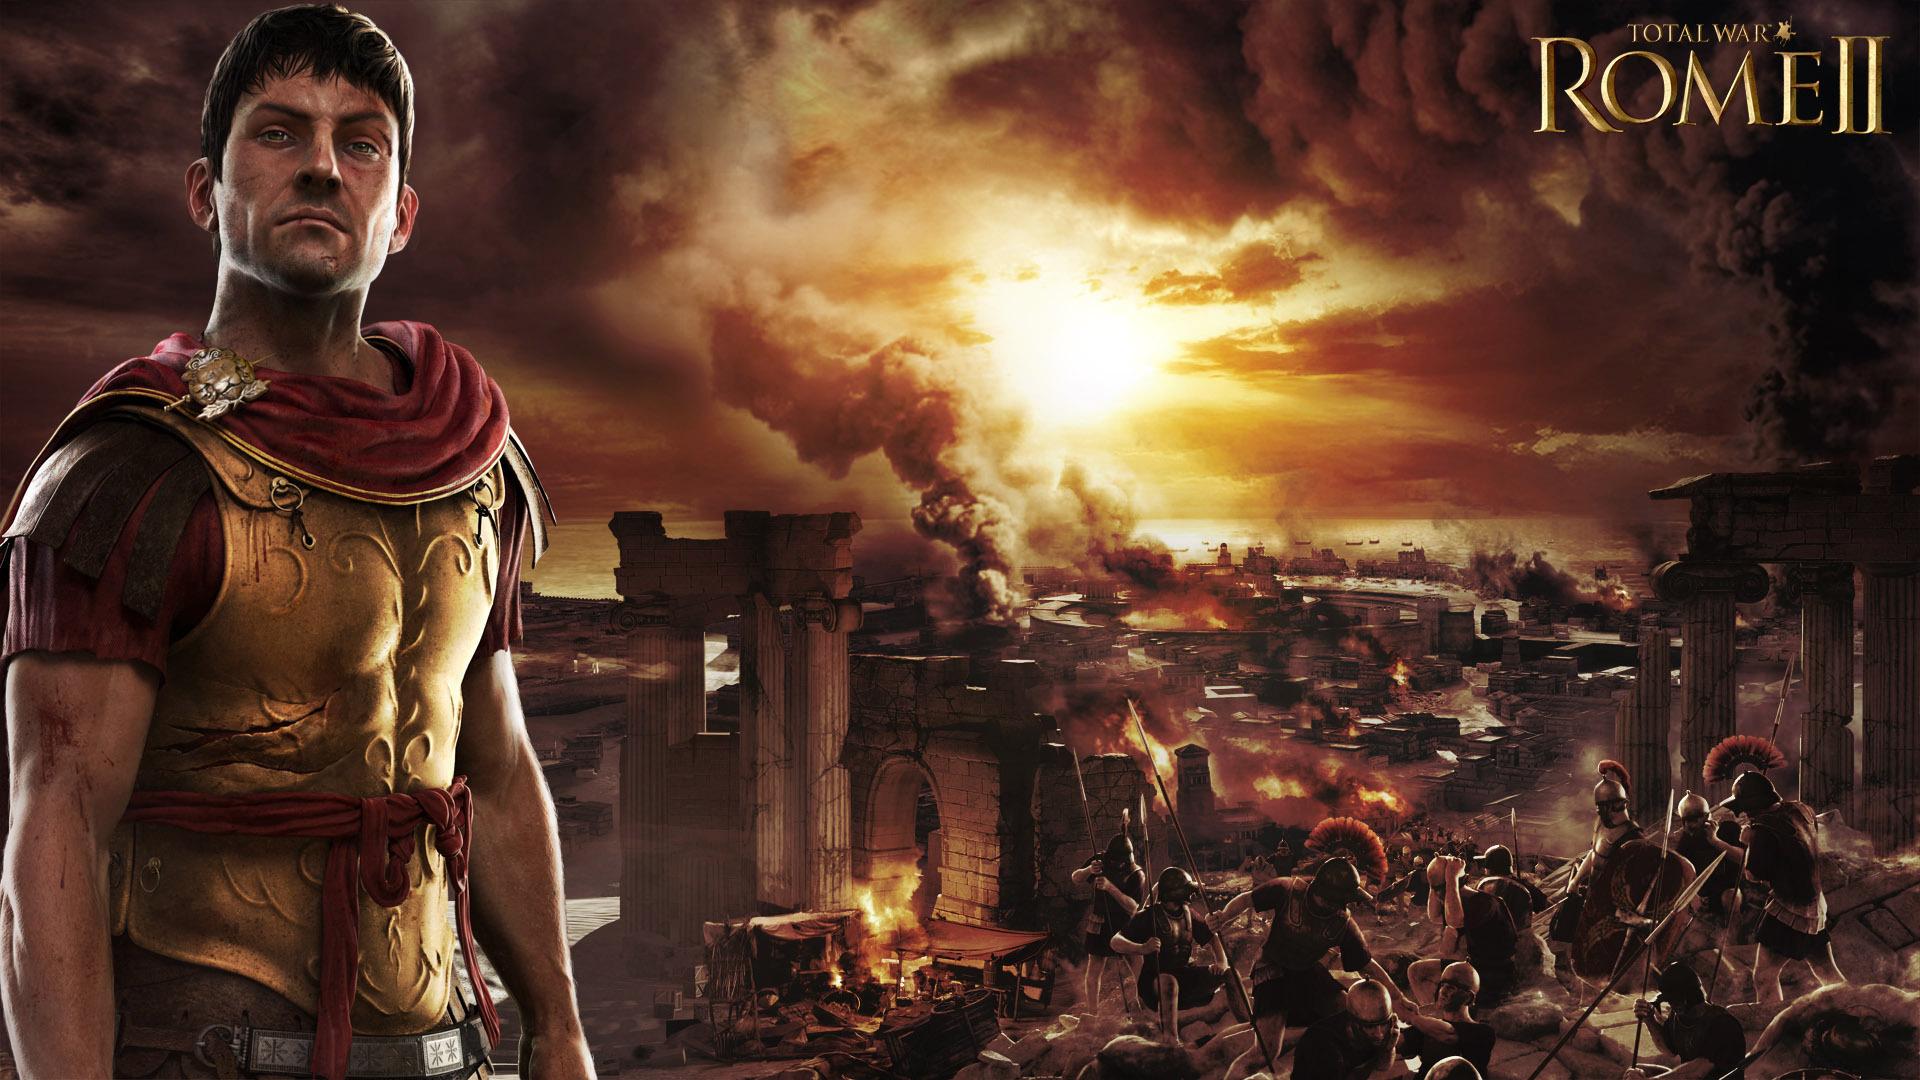 roman war wallpaper - photo #10